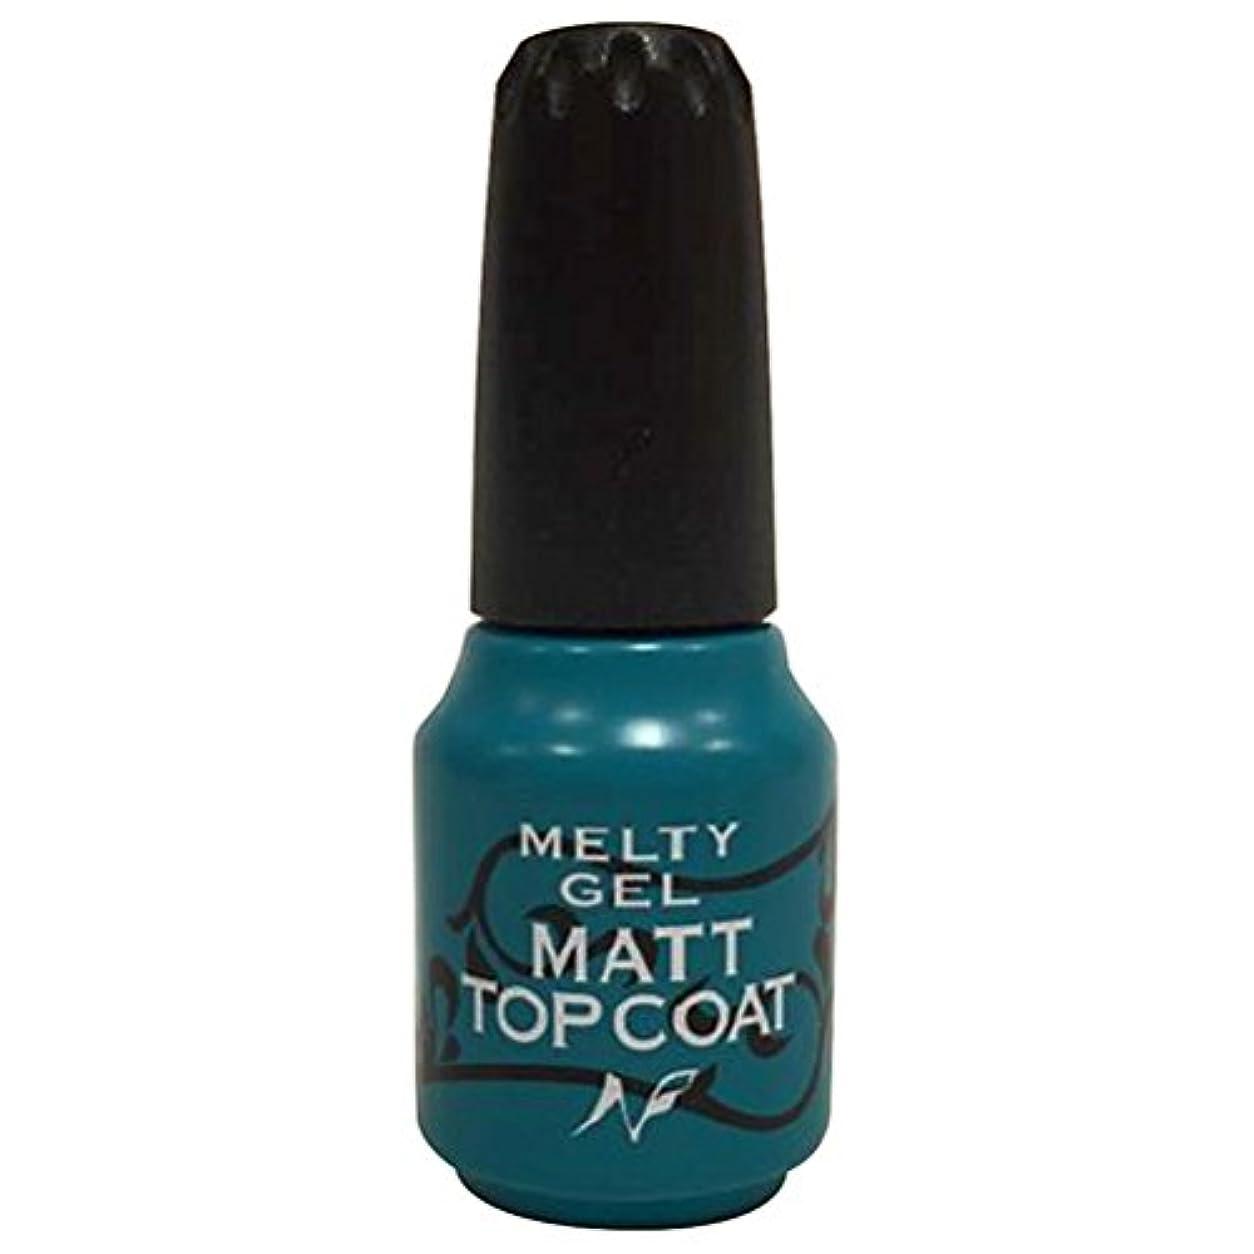 Melty Gel マットトップコート 14g